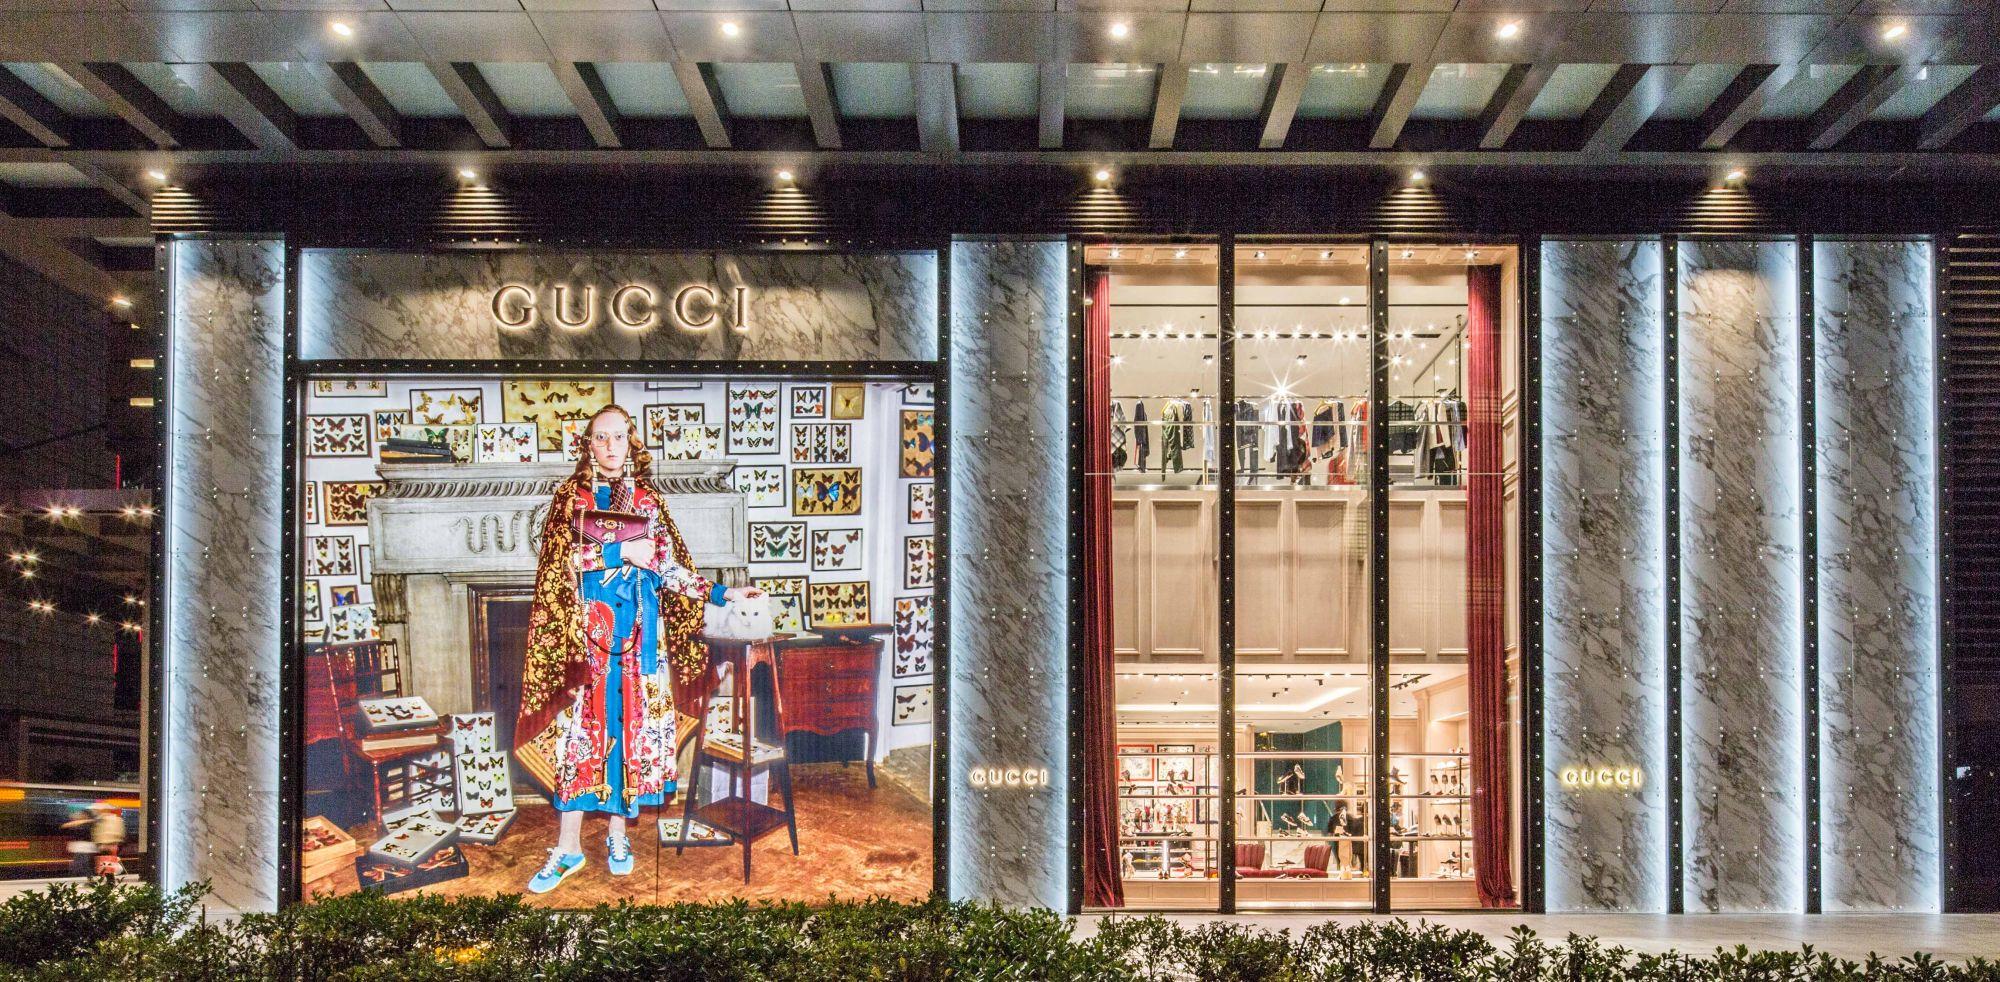 Gucci A4店 的新面貌充滿品牌創意總監 Alessandro Michele 的絕妙奇想。